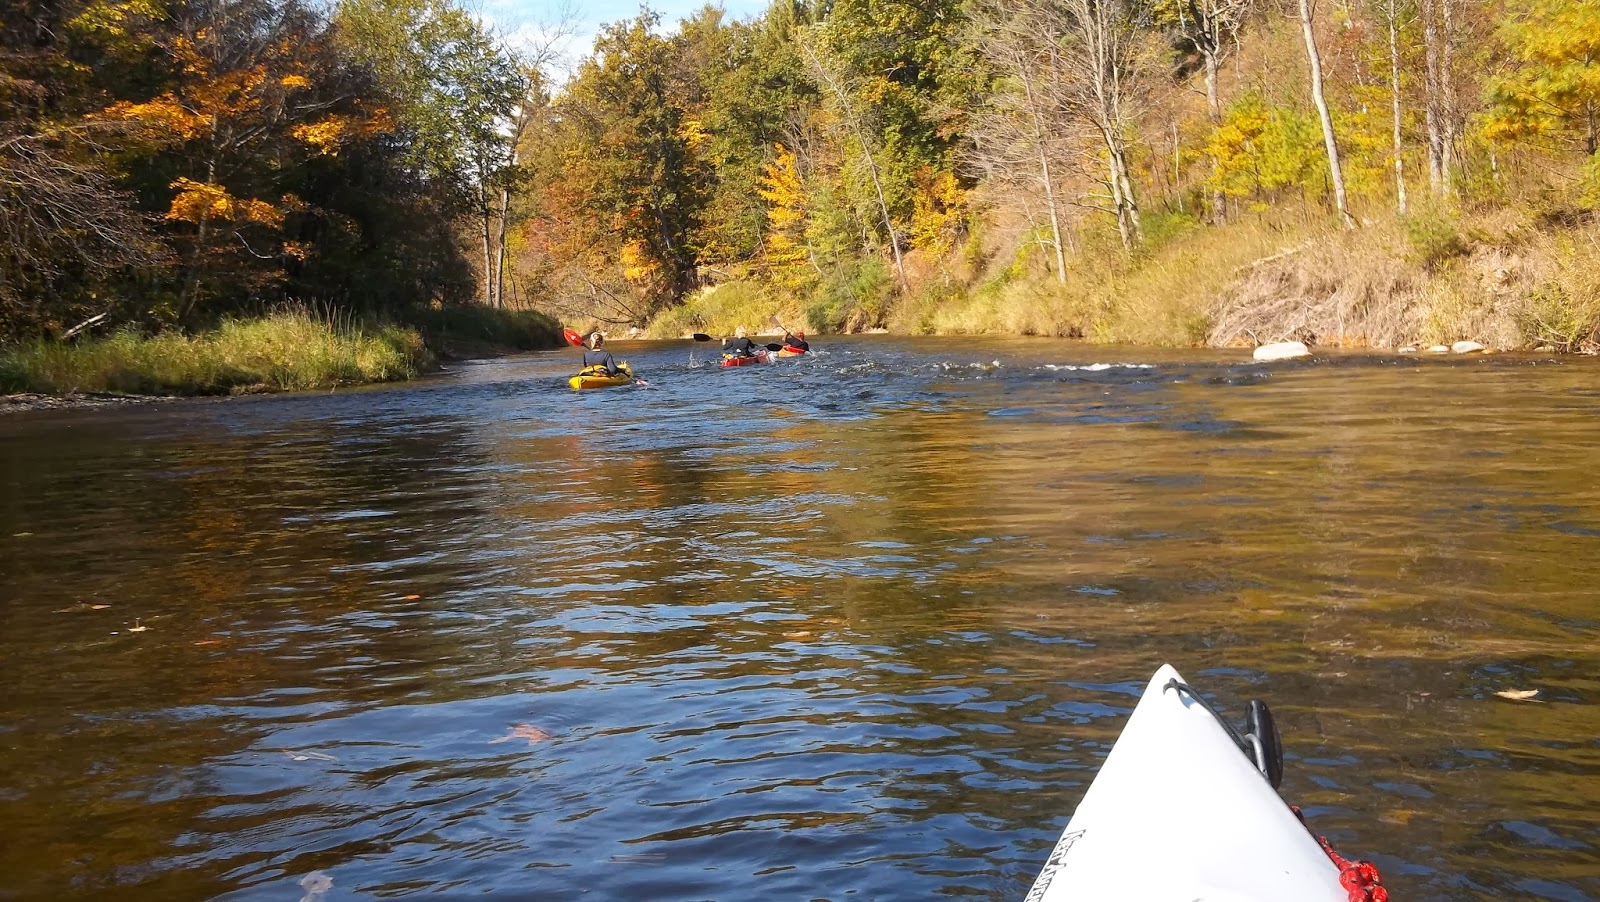 Kayaking Michigan Rivers: Little Muskegon River - Daggett